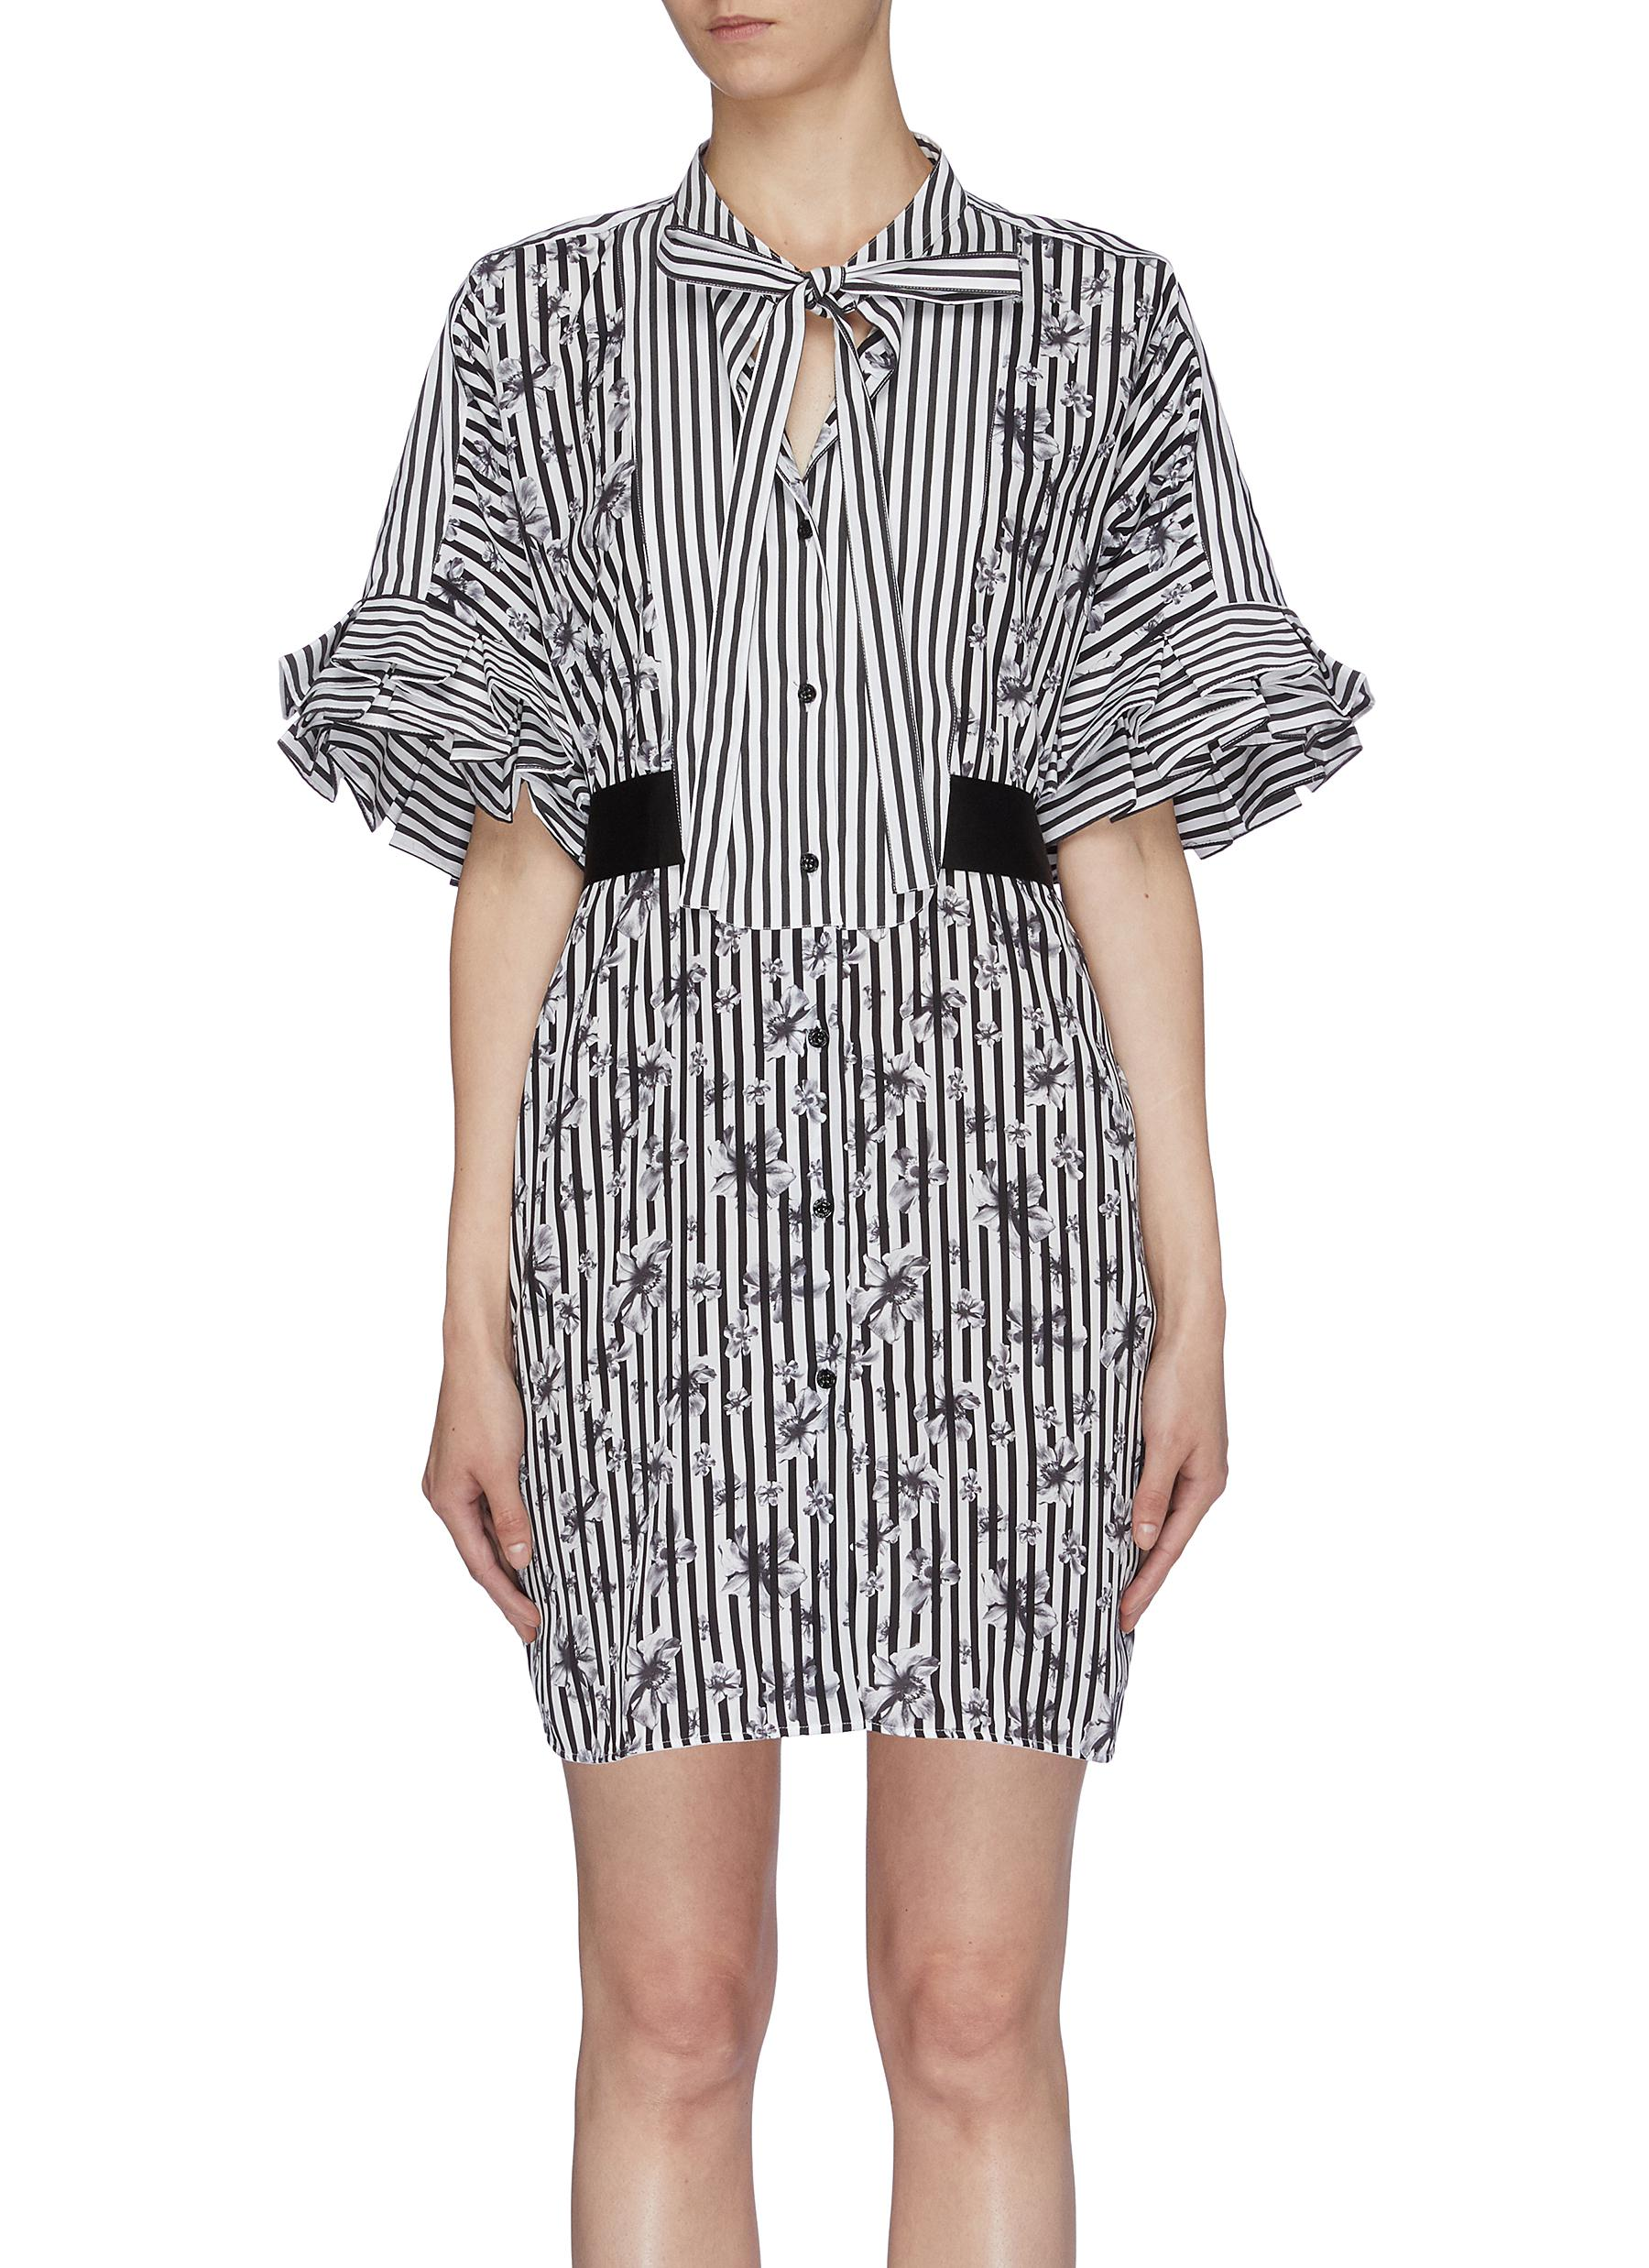 Tie neck floral print stripe shirt dress by Neil Barrett